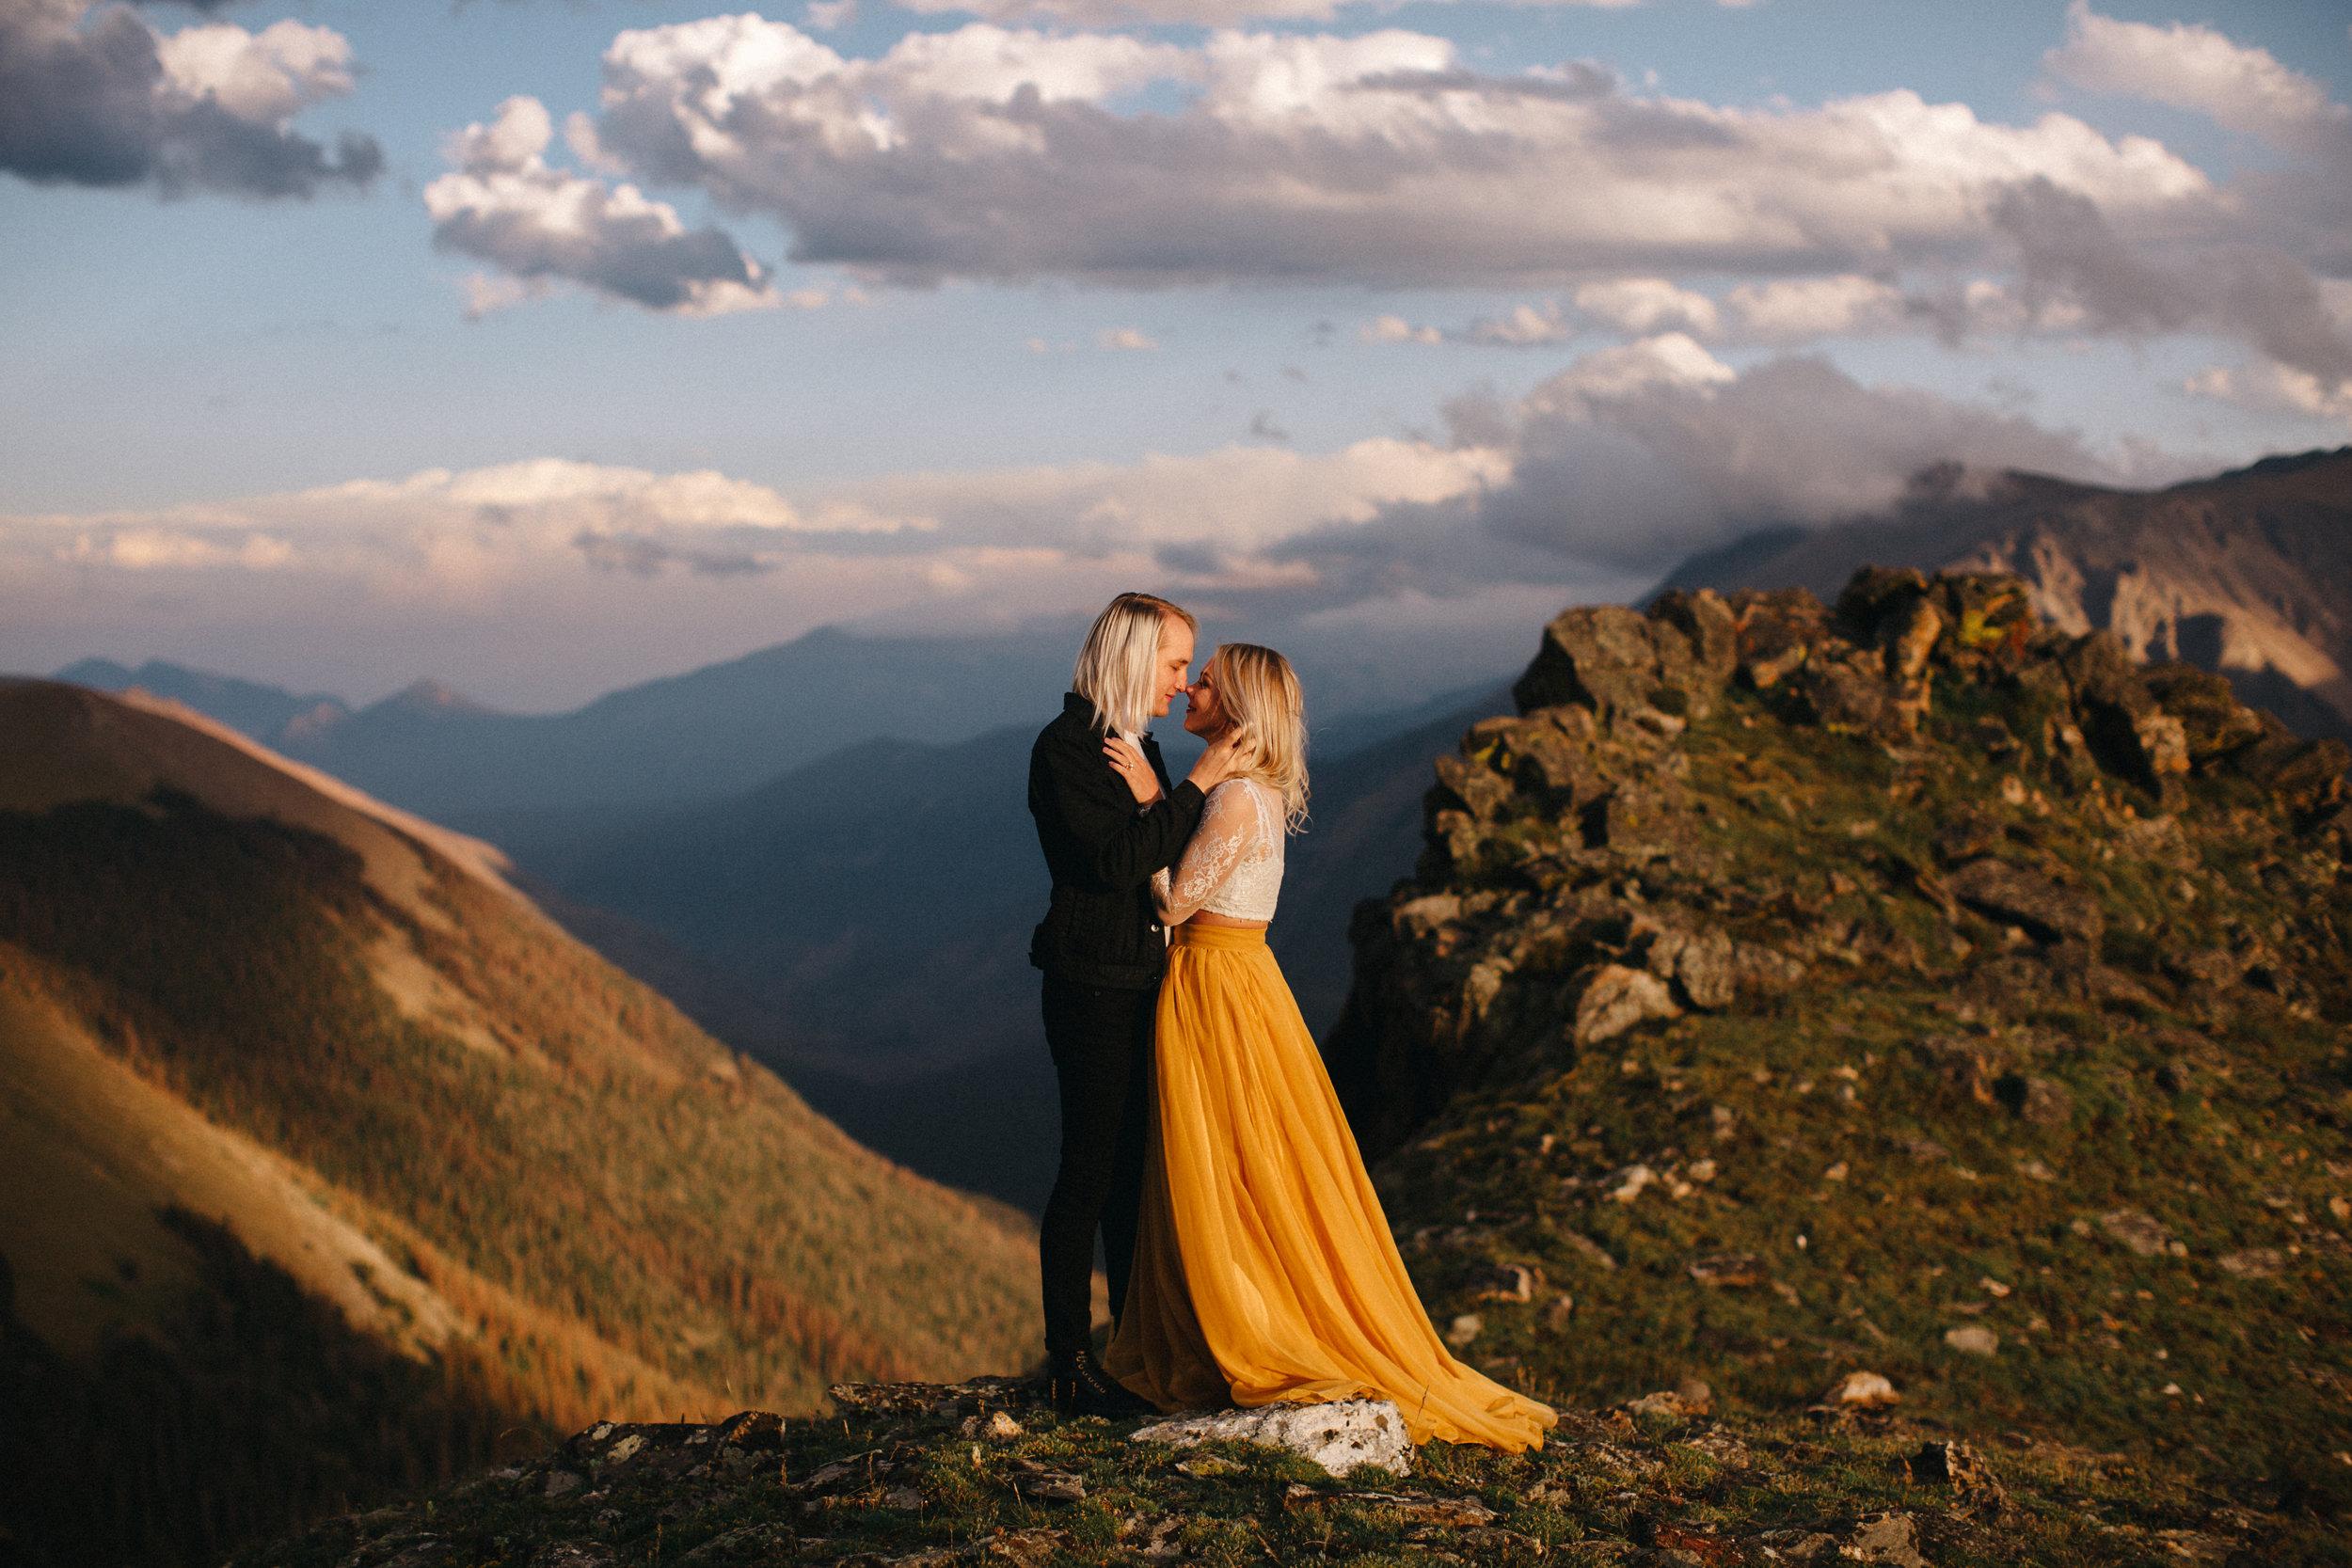 Liz Osban Photography Rocky Mountain National Park Trail Ridge Road Sweet Carolina Styles Skirt Marigold Yellow Cole Janzen Kelli Mantooth Mountains Colorado Northern Estes Park Alpine Elopement Wedding Destination Adventure LBGT Engaged45.jpg